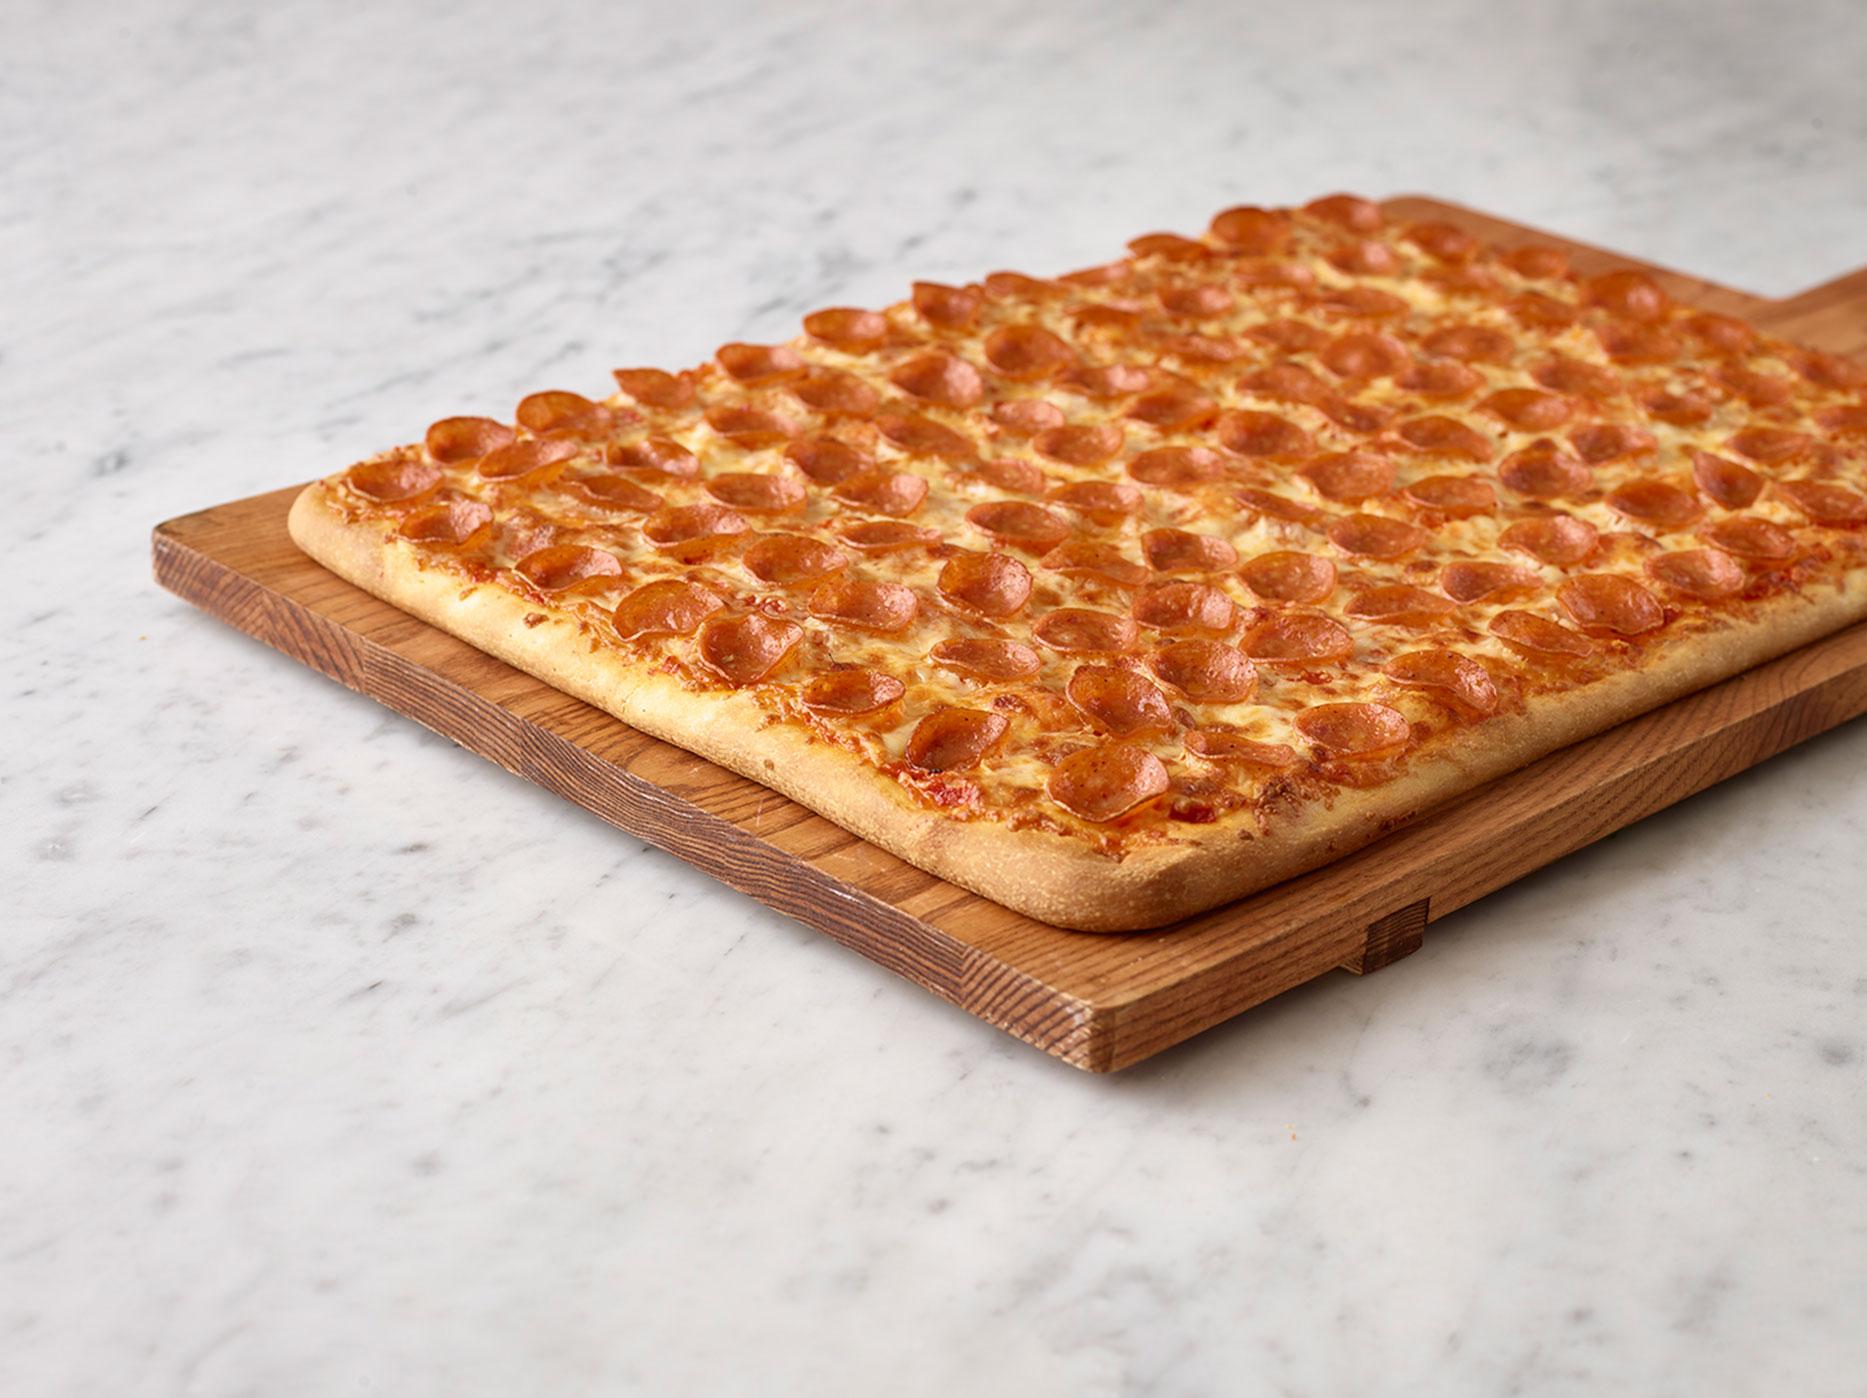 party 1 topping pizza nova. Black Bedroom Furniture Sets. Home Design Ideas